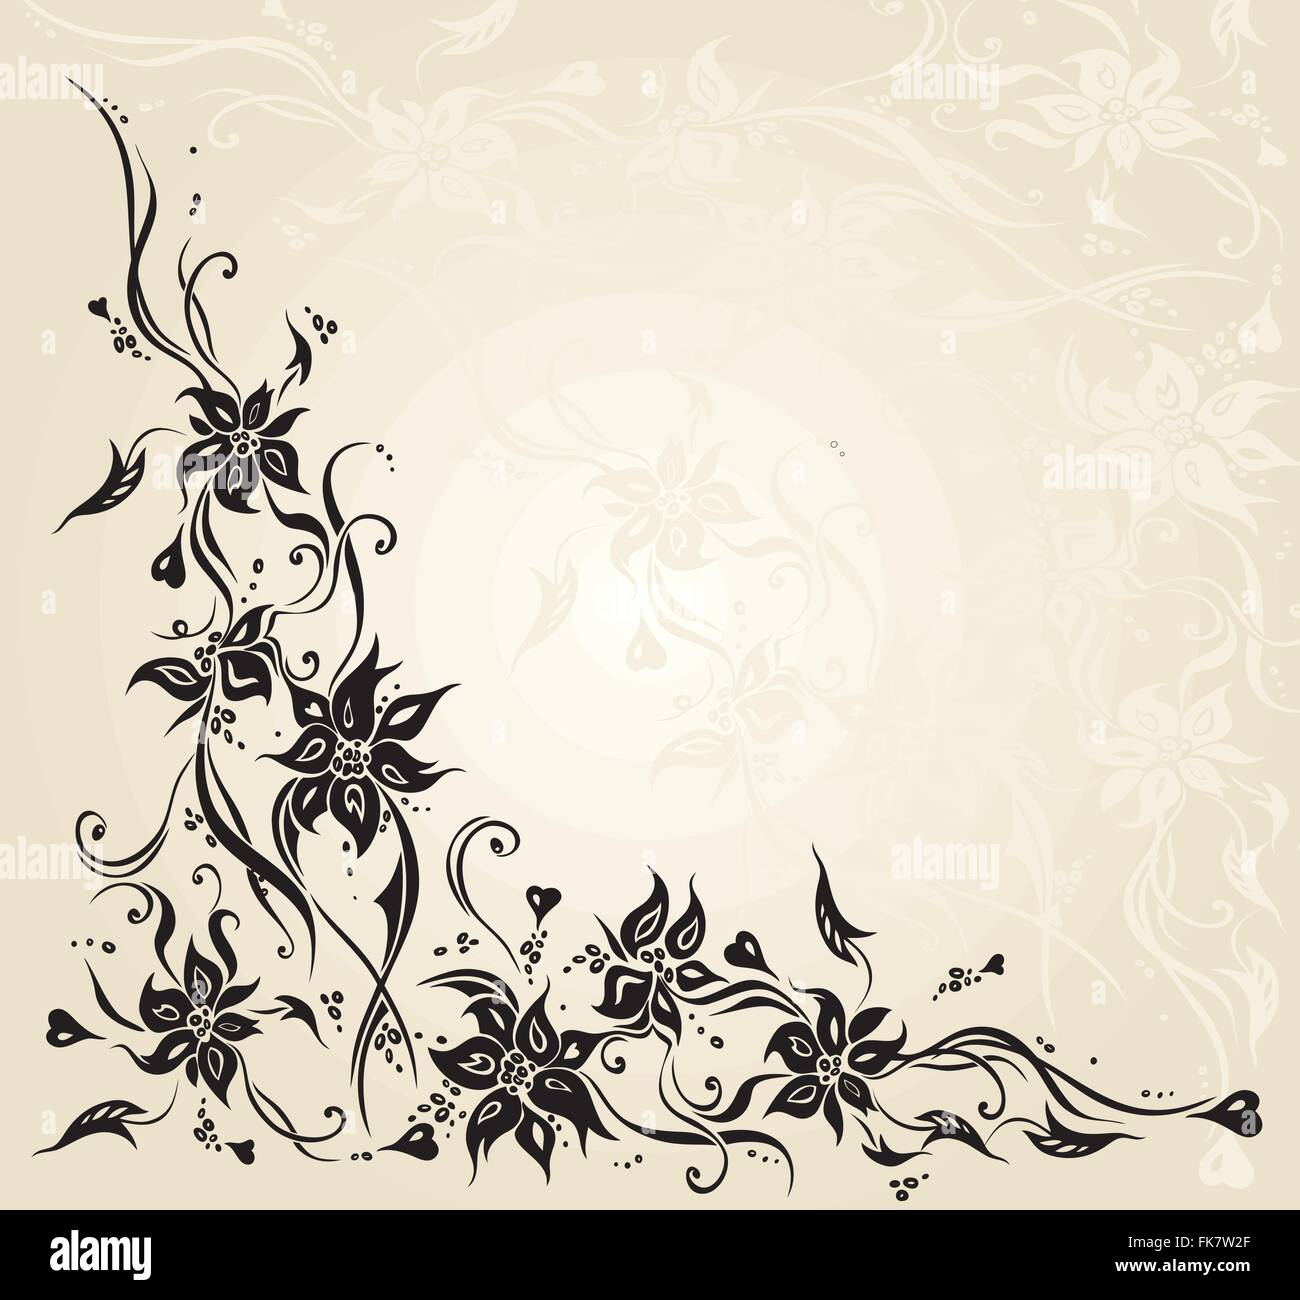 Ecru vintage floral decorative invitation wedding background design ...